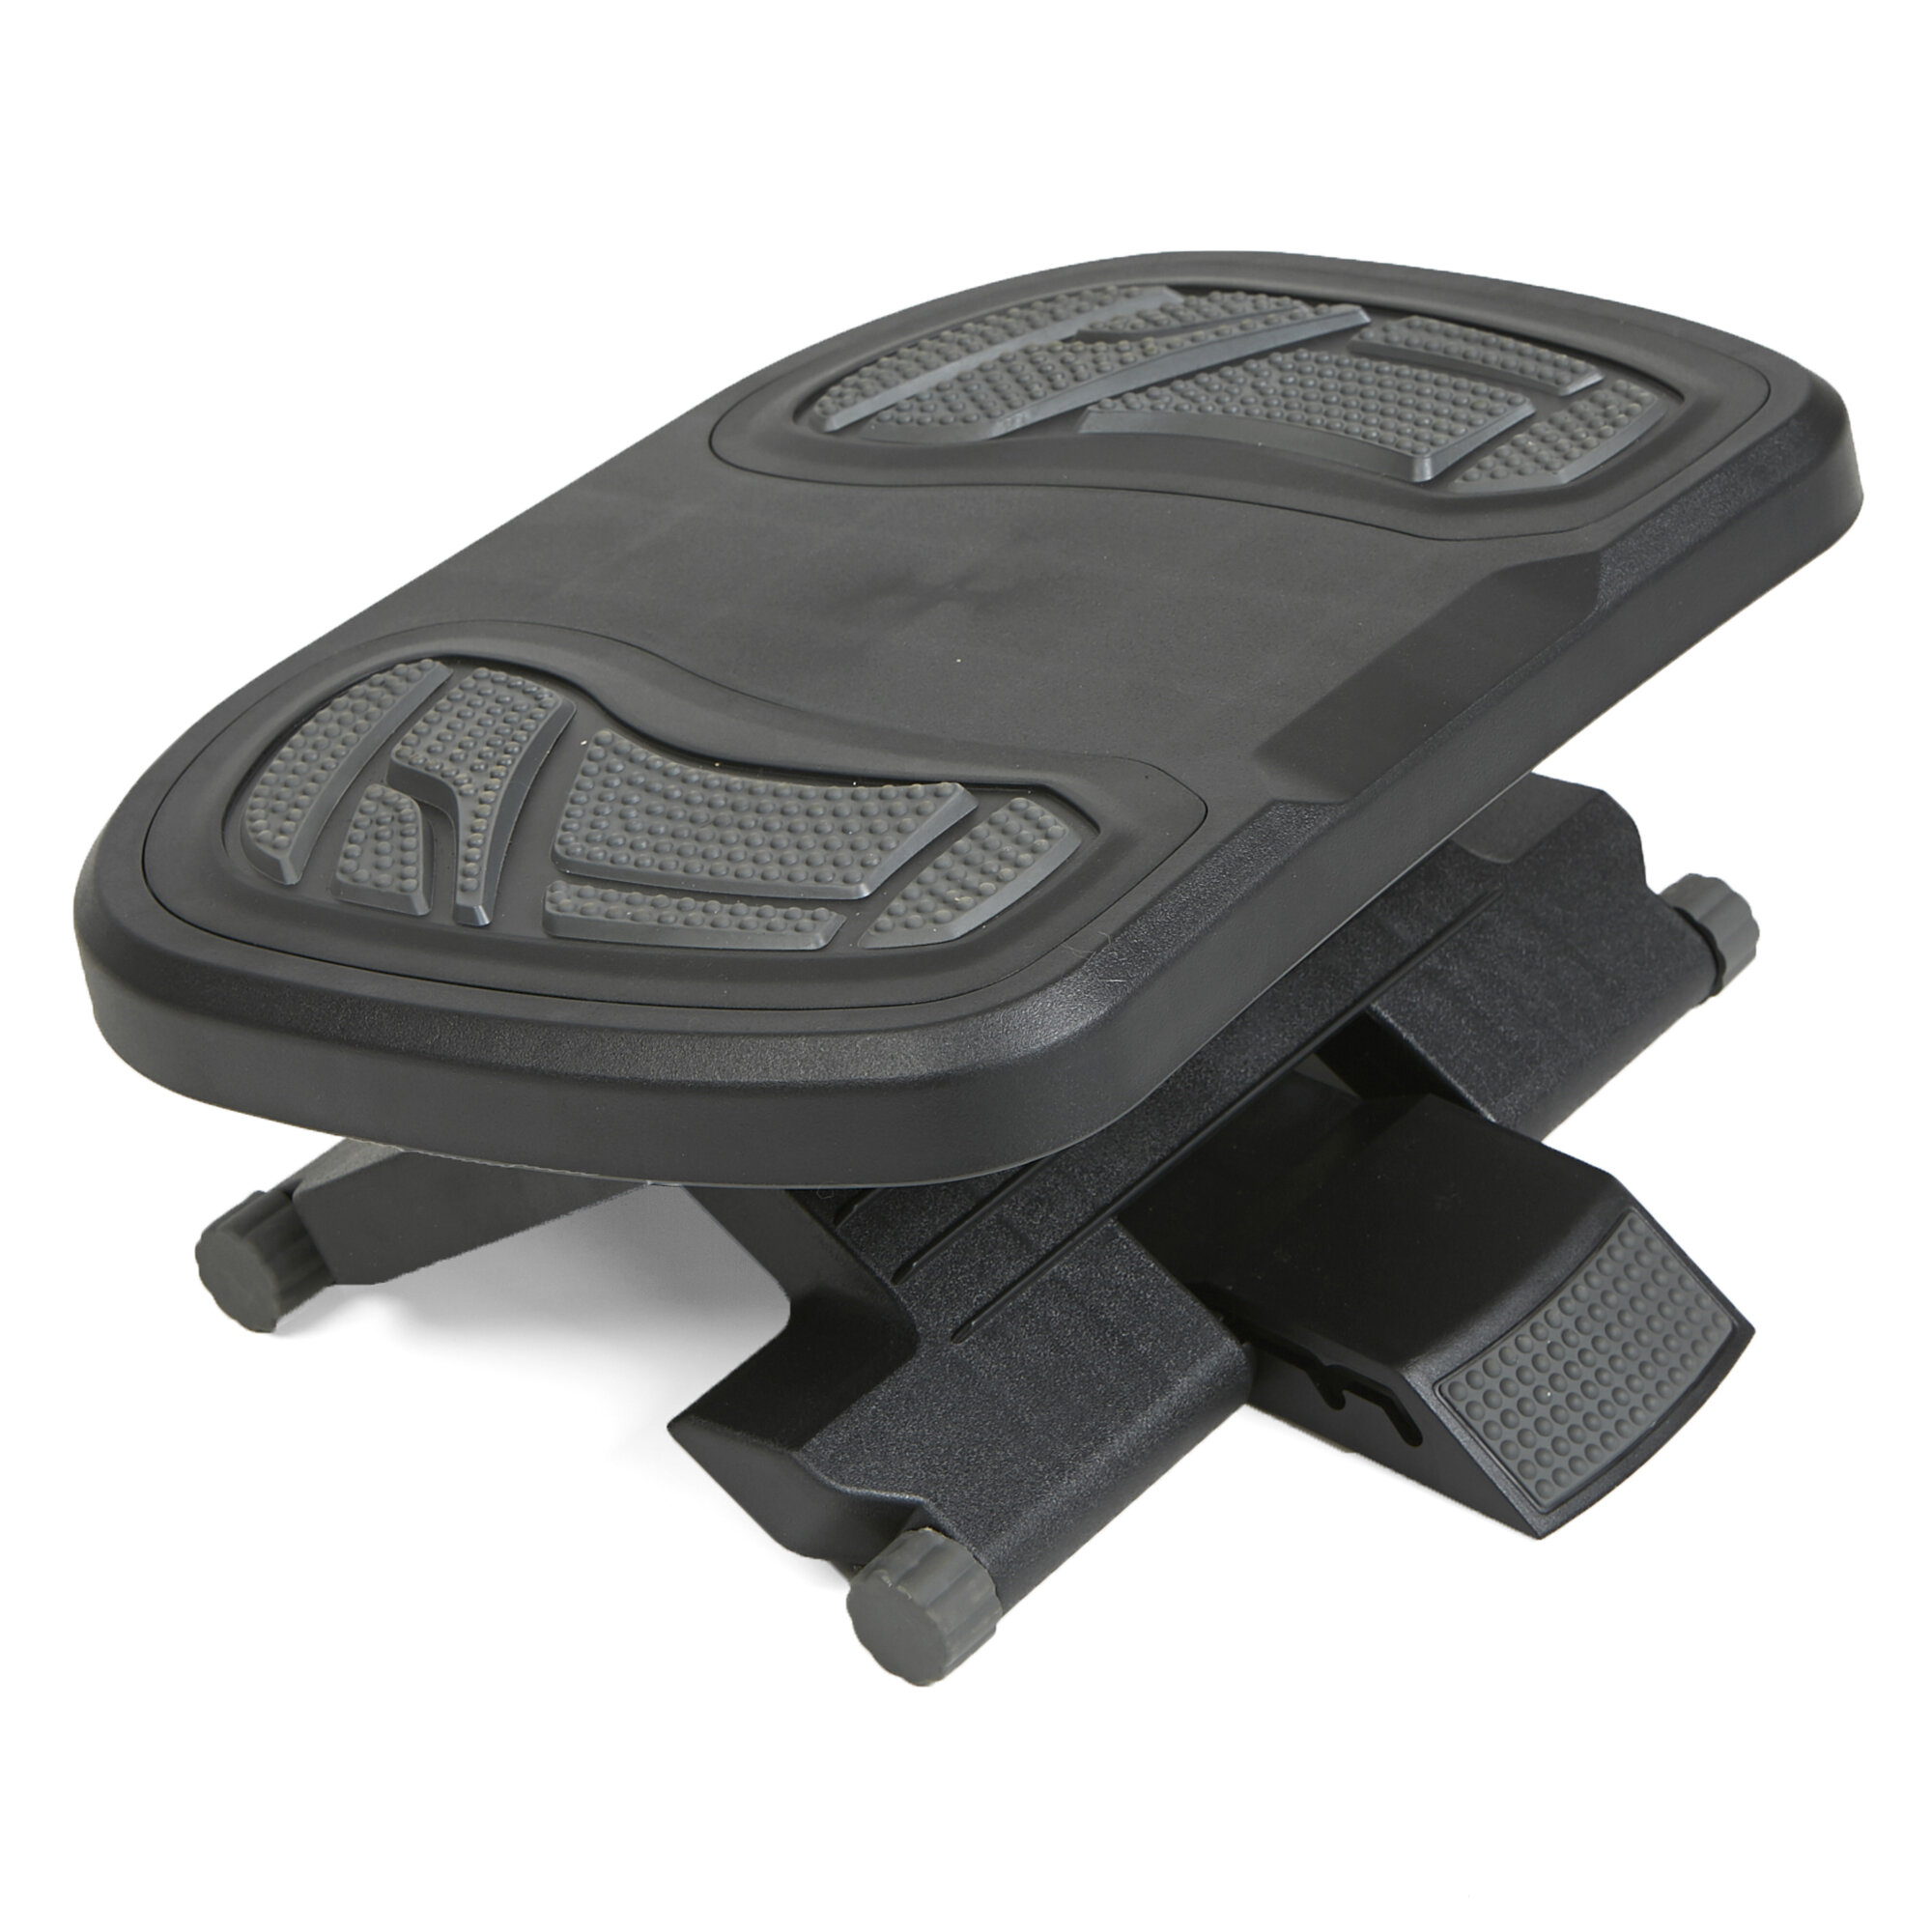 Mind Reader Adjustable Height Under Desk Non Slip Ergonomic Foot Rest With Foot Prints Reviews Wayfair